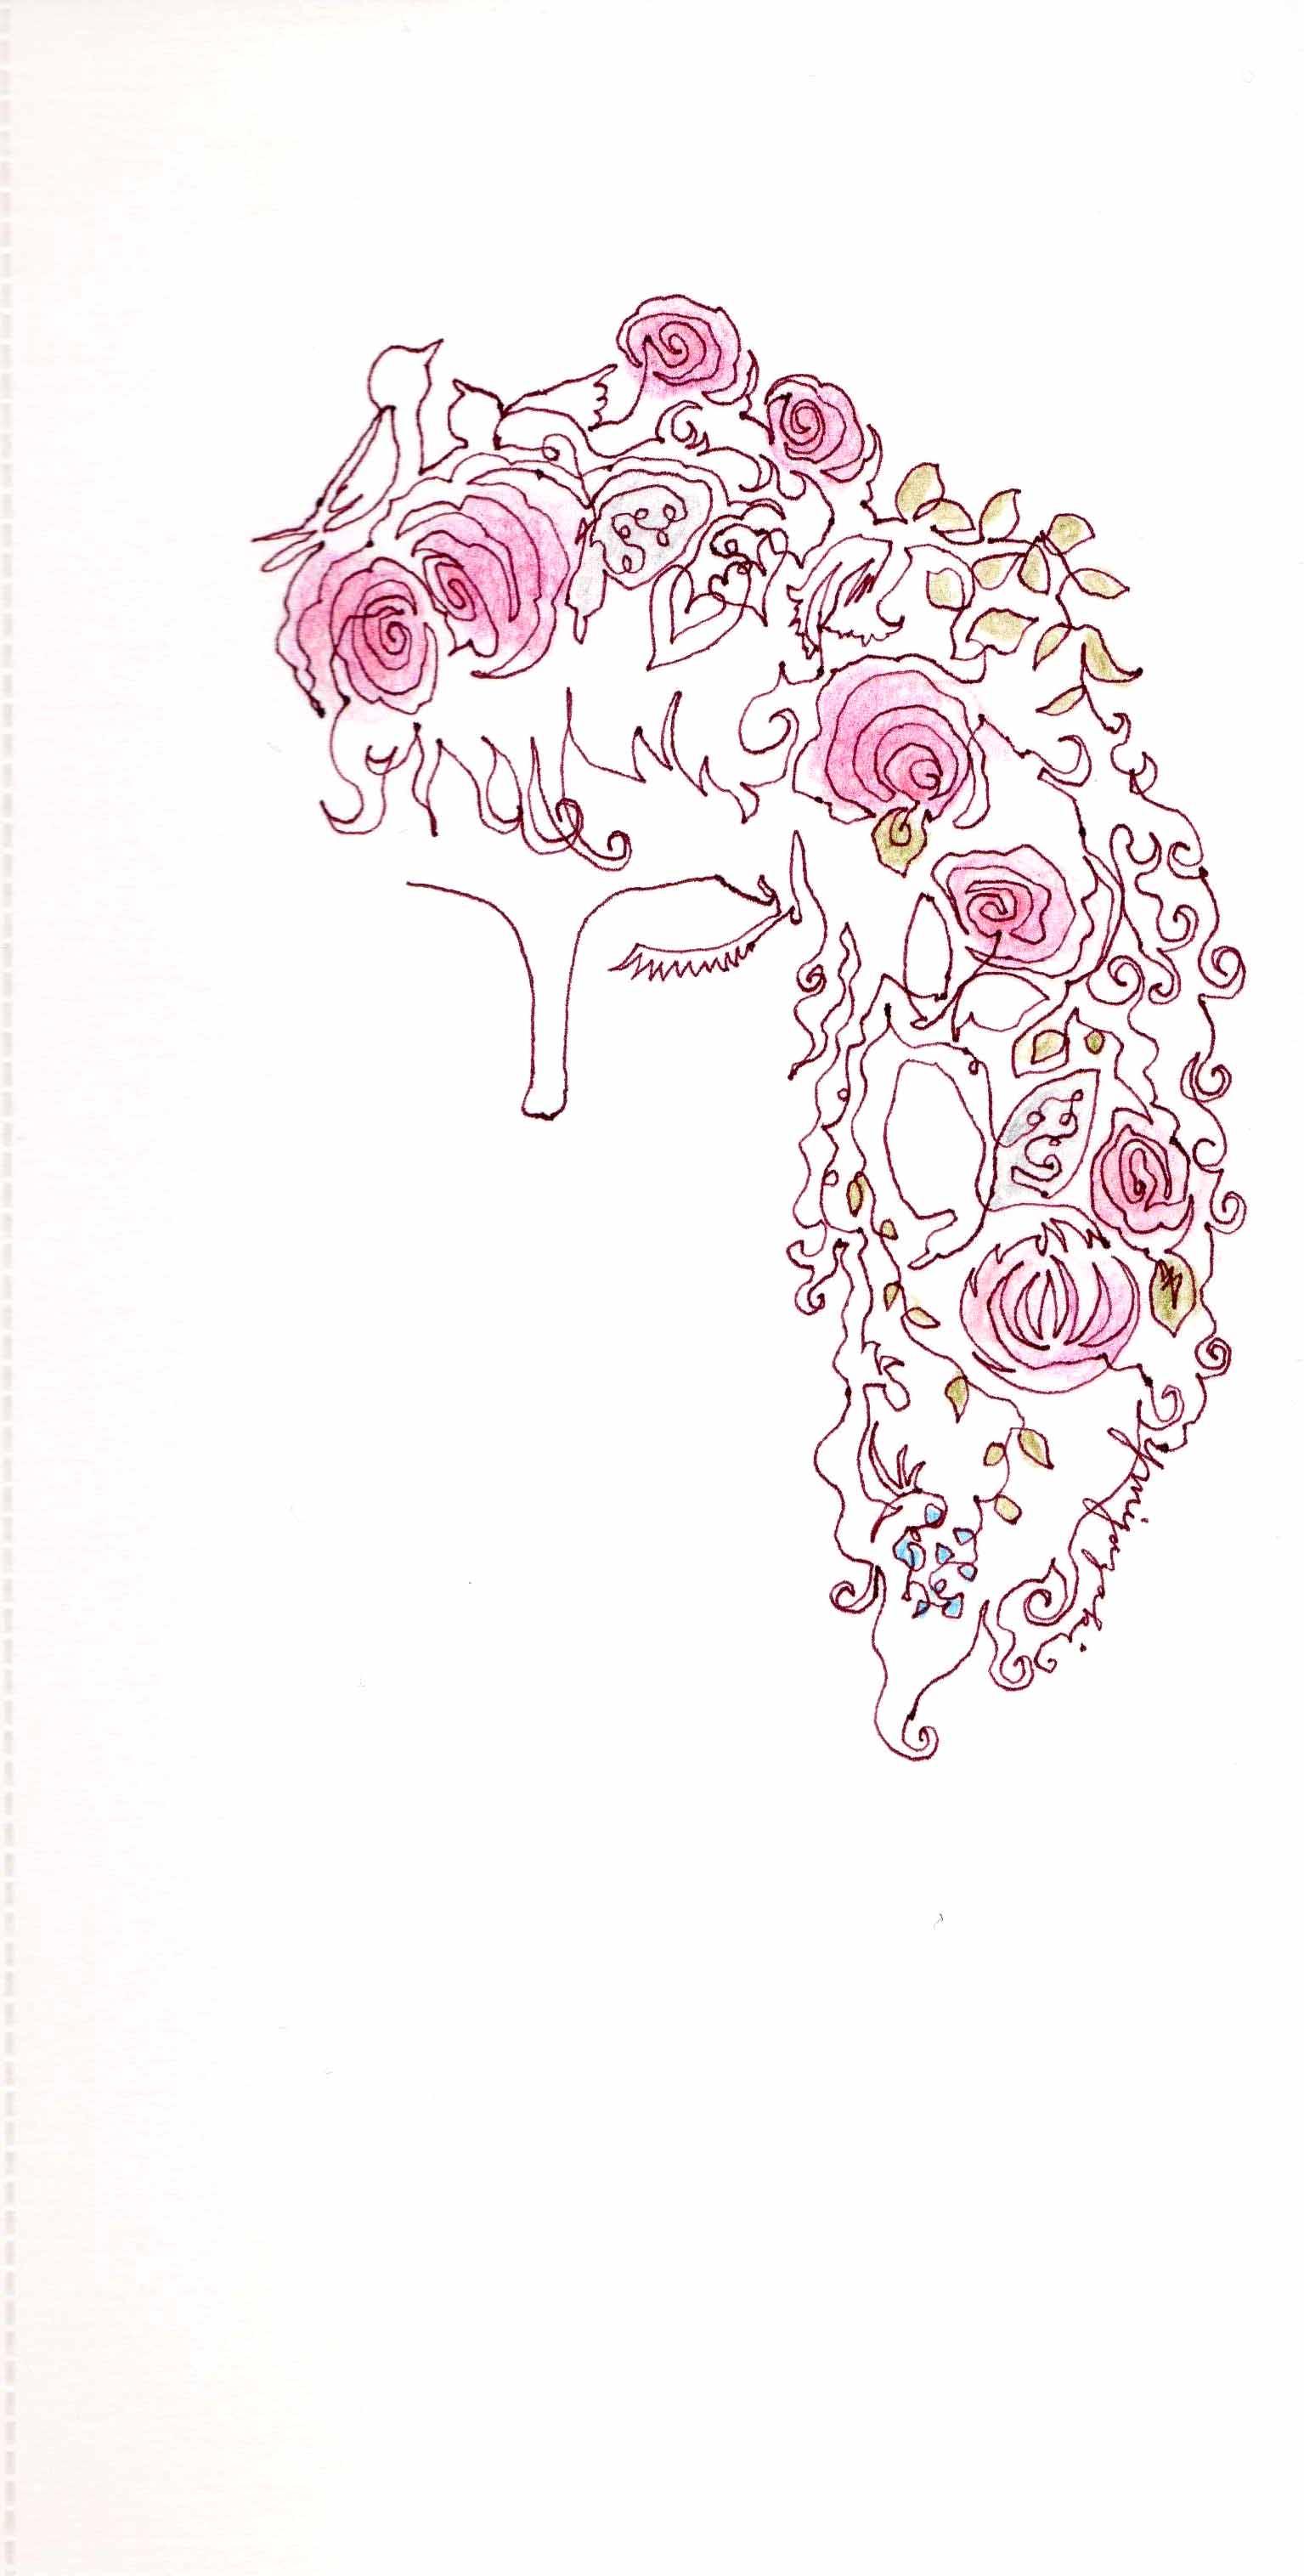 rosewomen.jpg